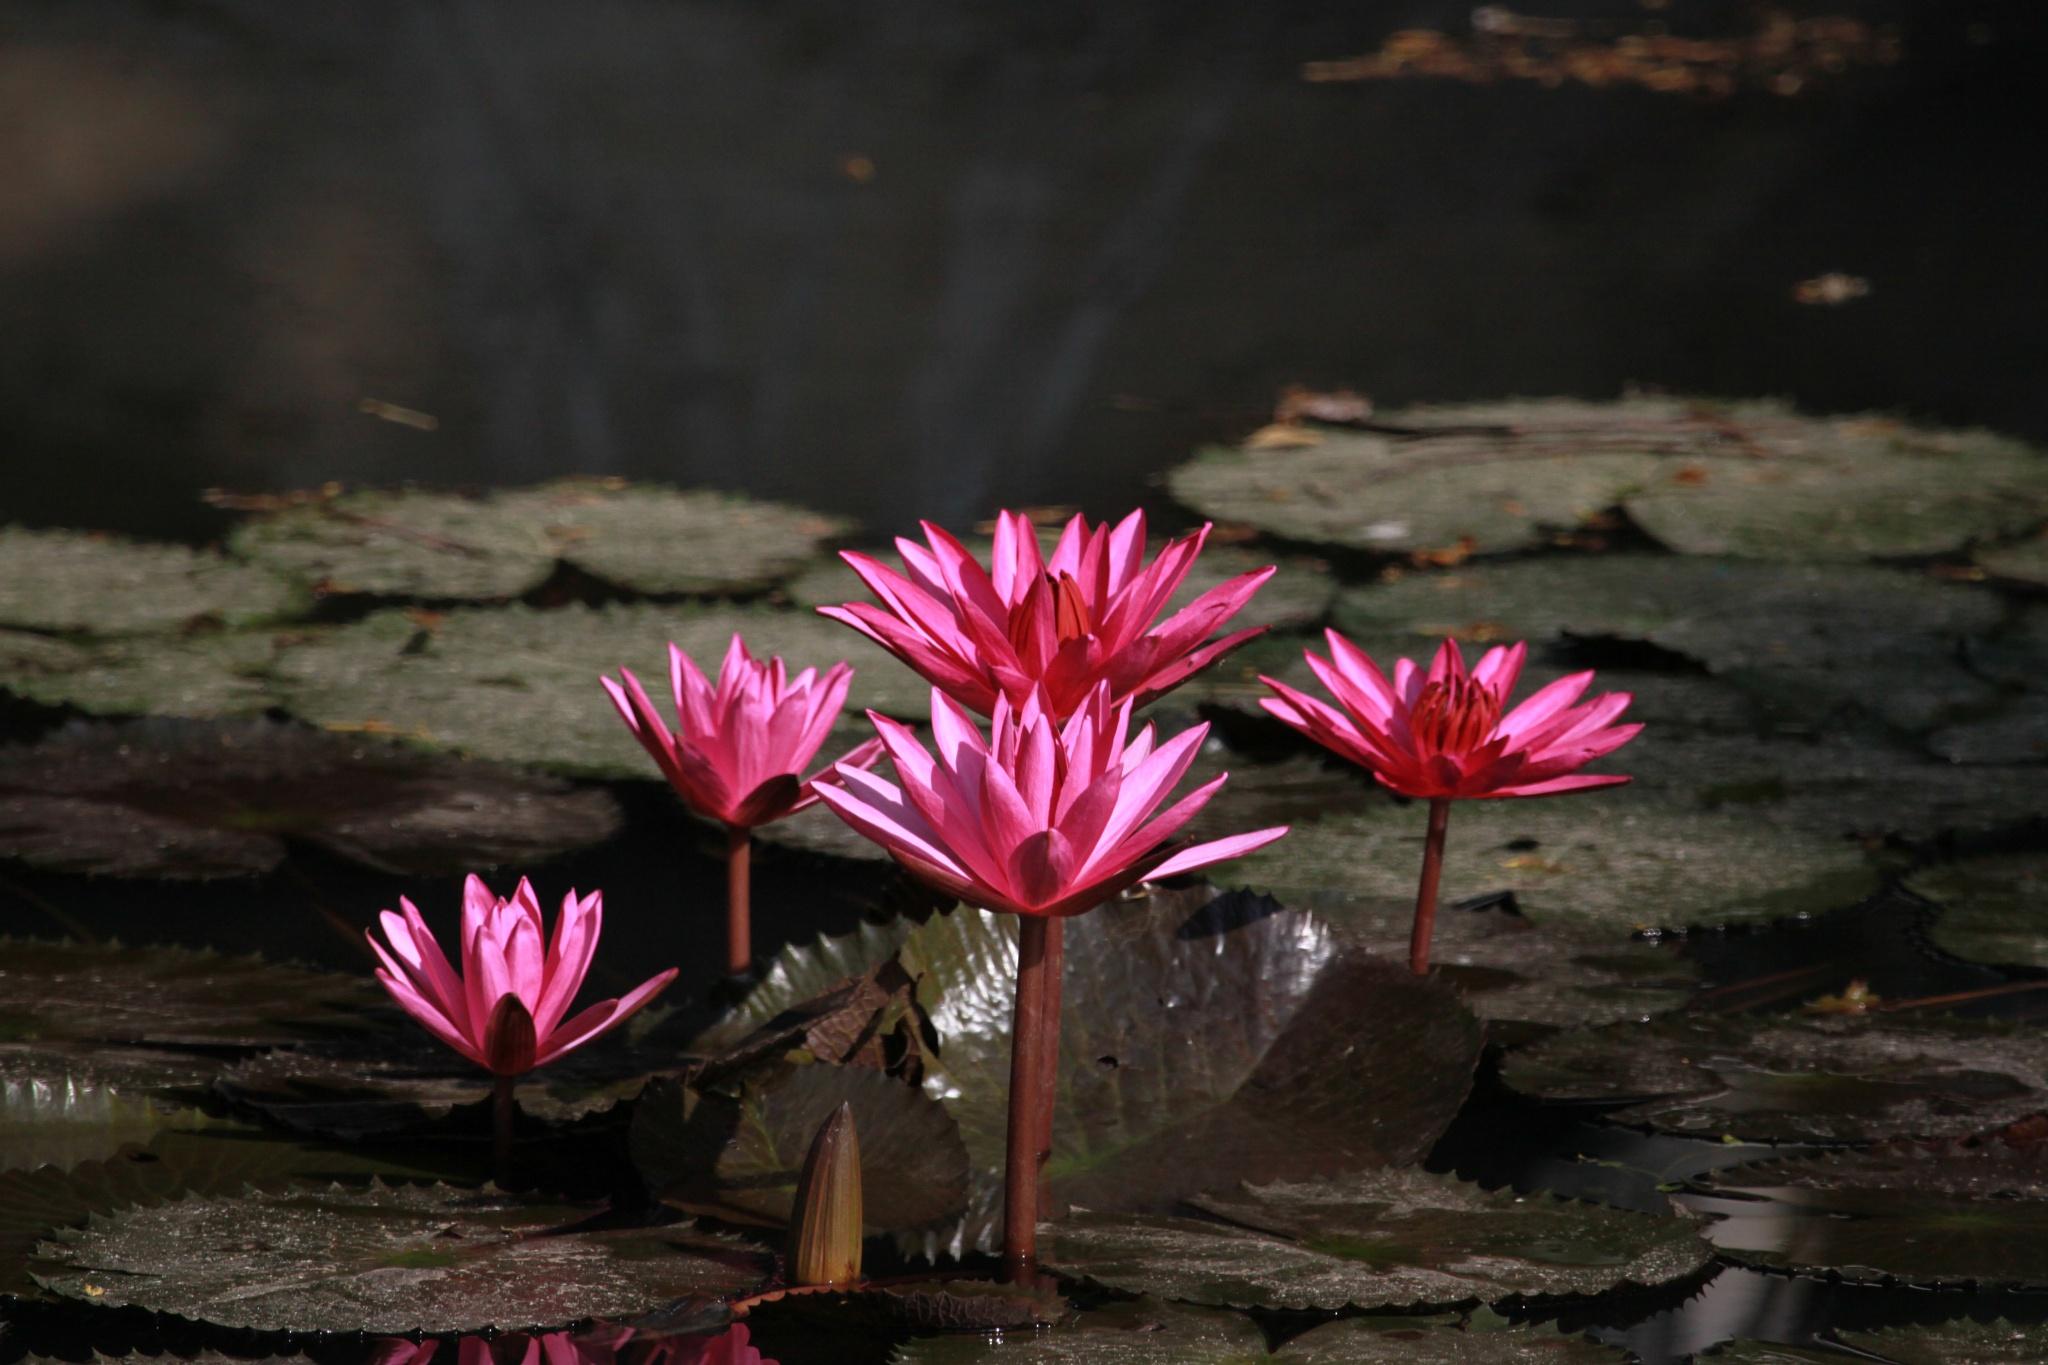 Water Lilies by Ravinarayana Chakravarthy